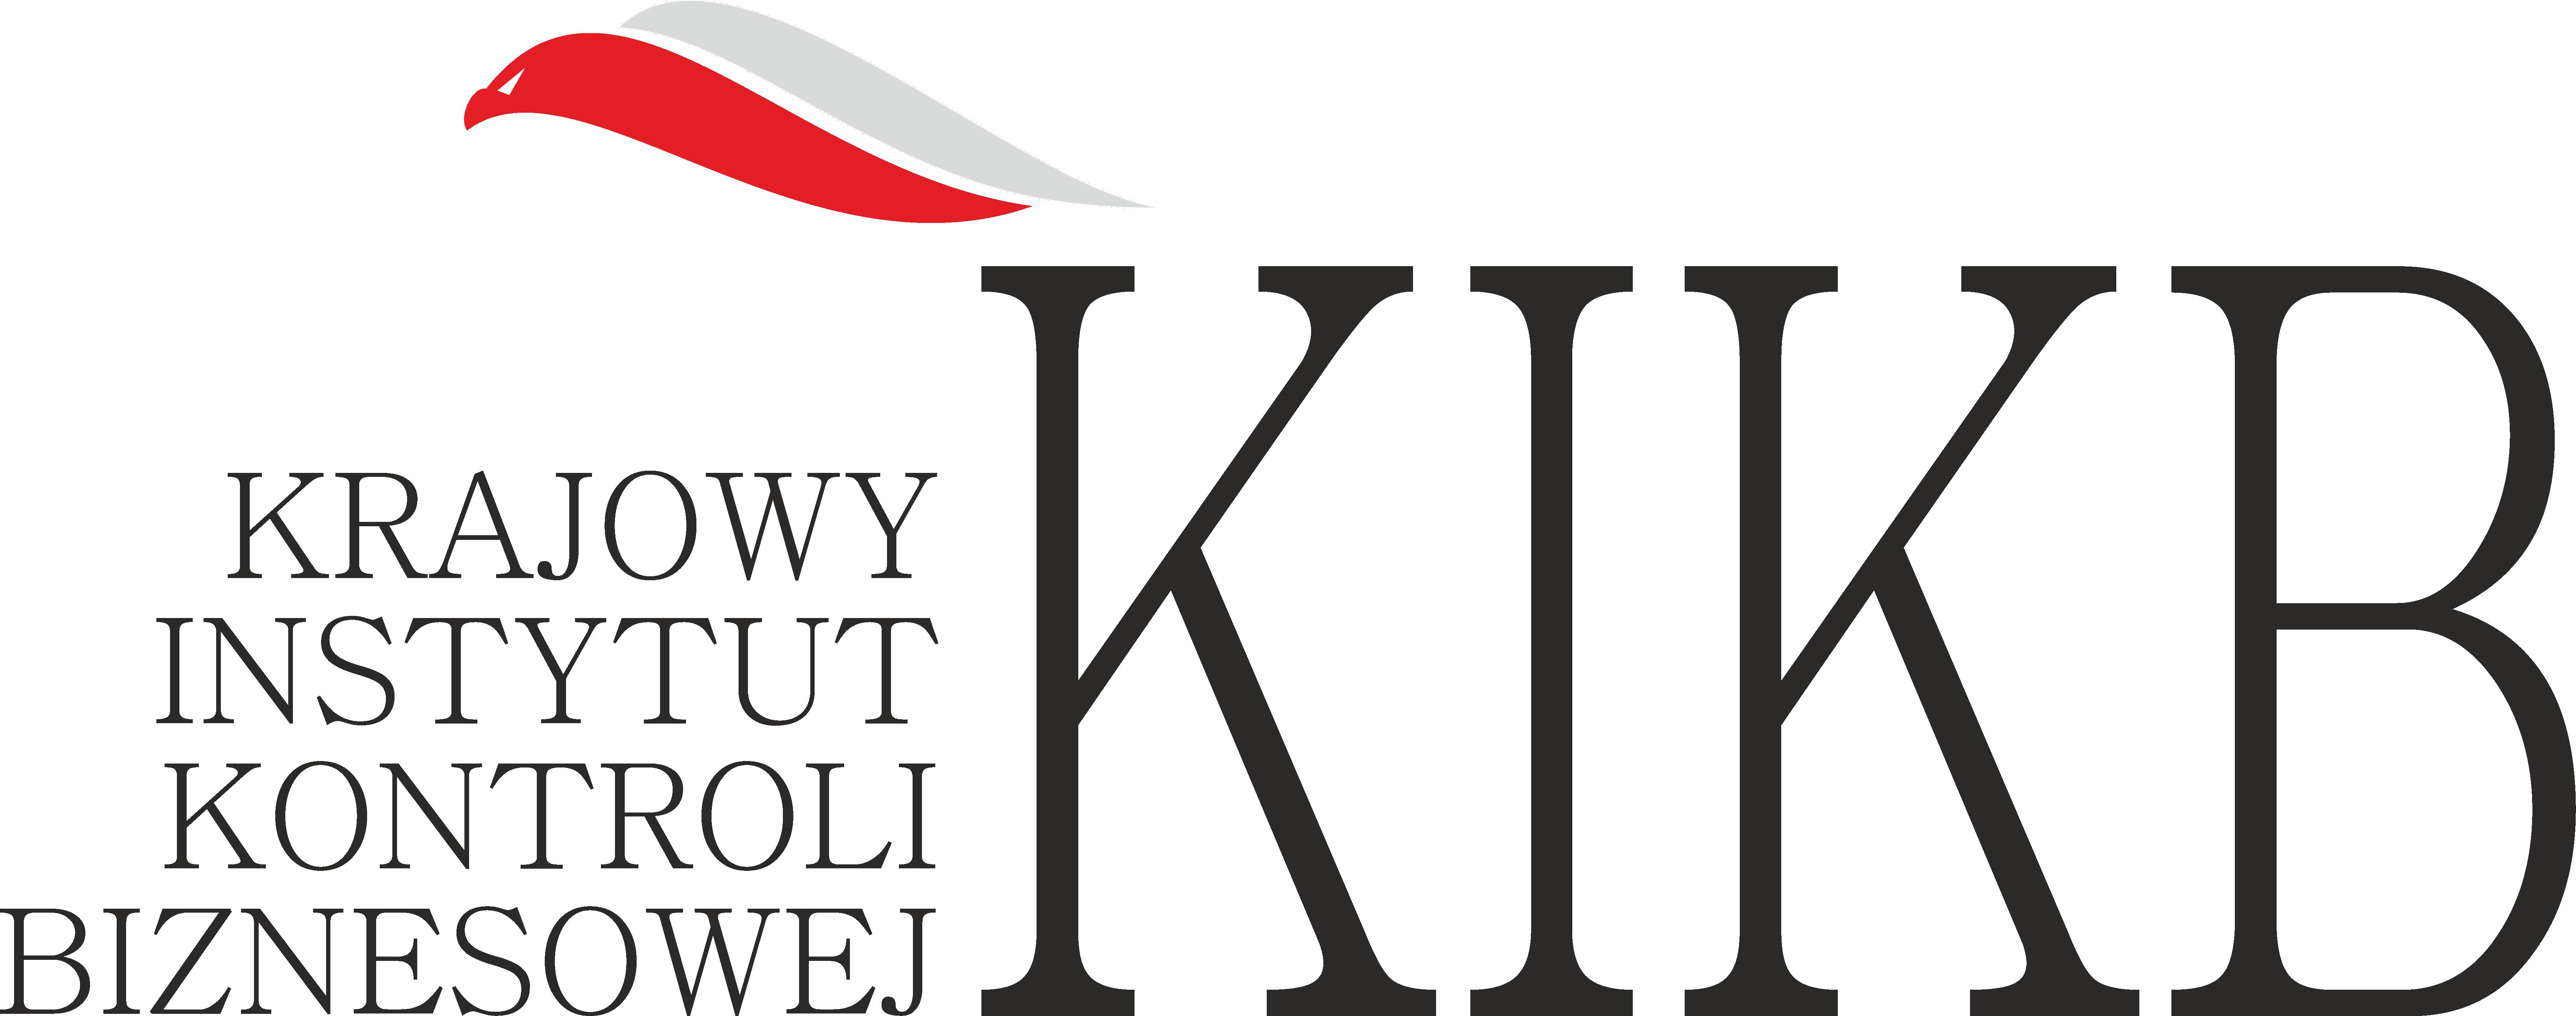 kikb_logo